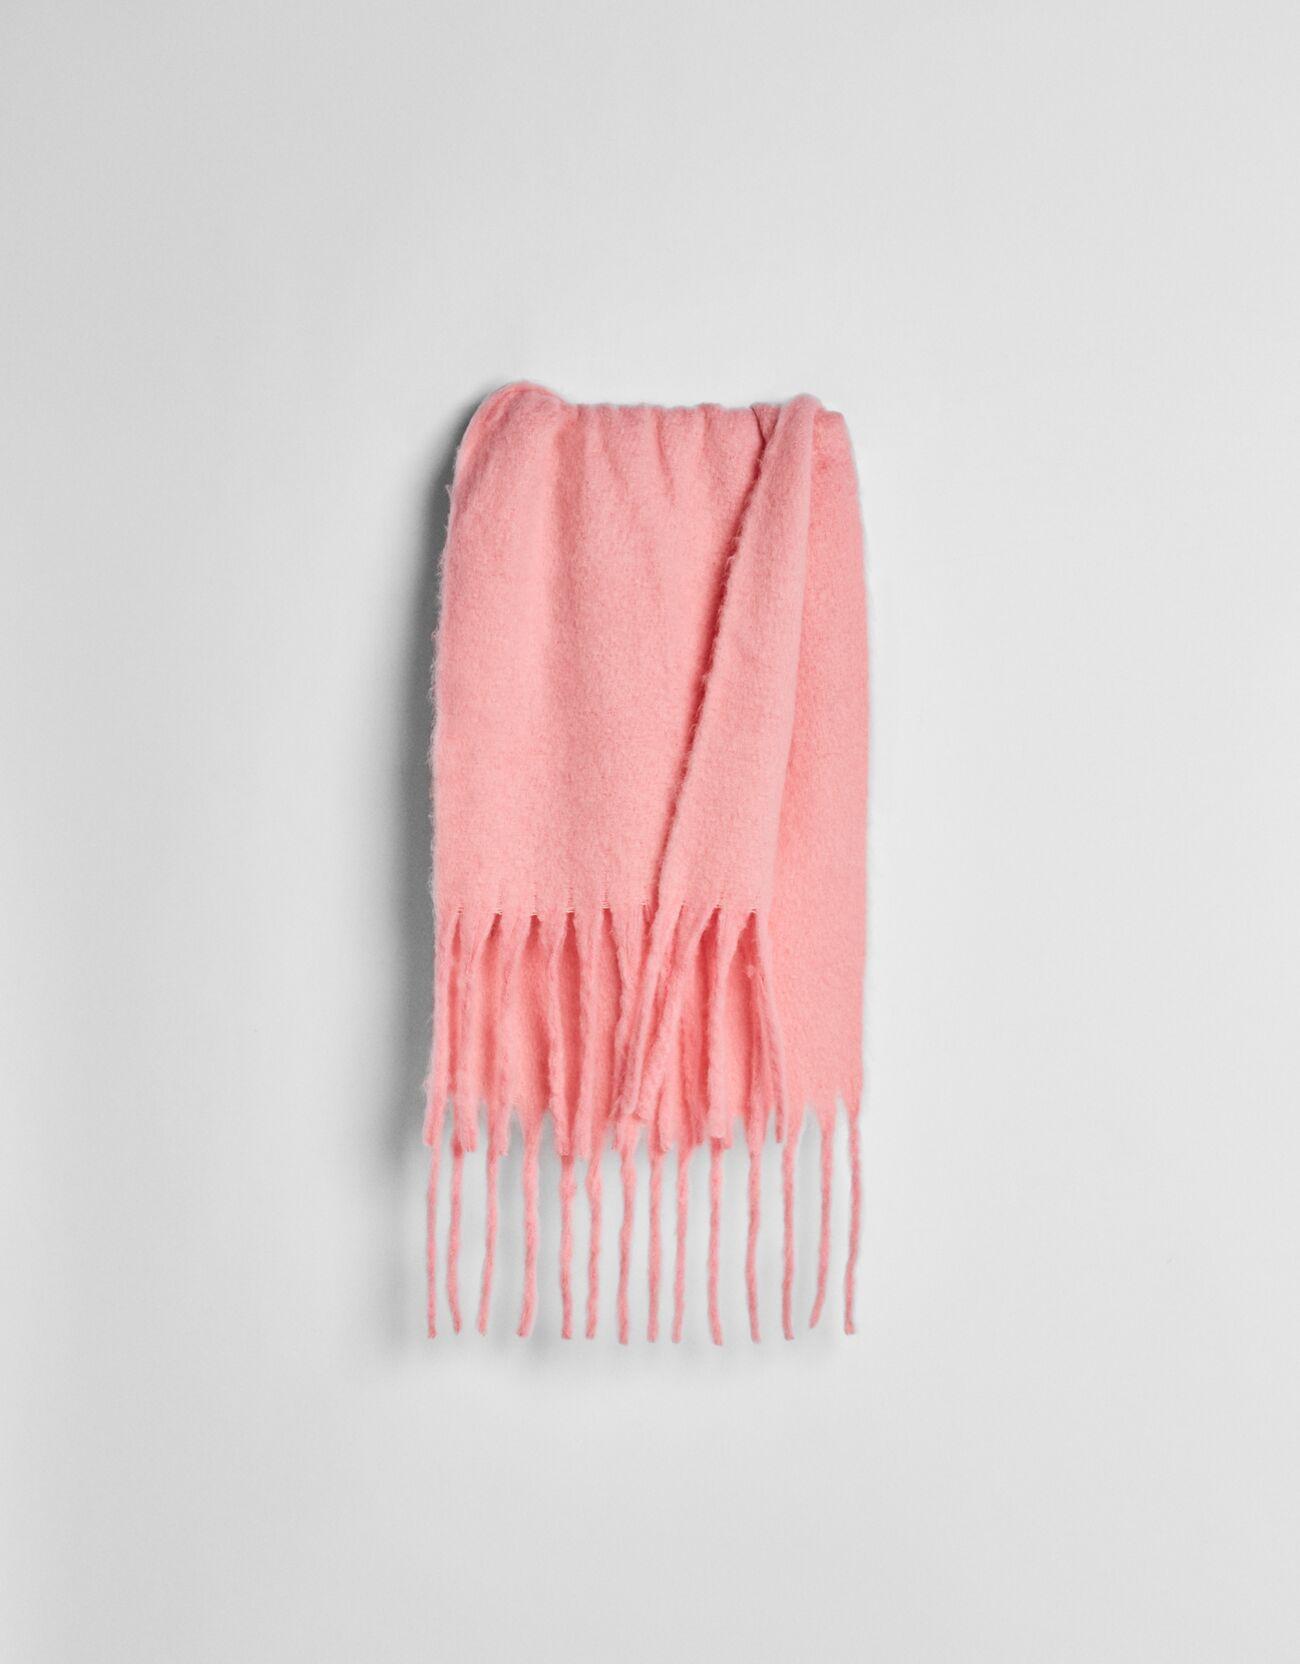 Bufanda rosa en tono neón.